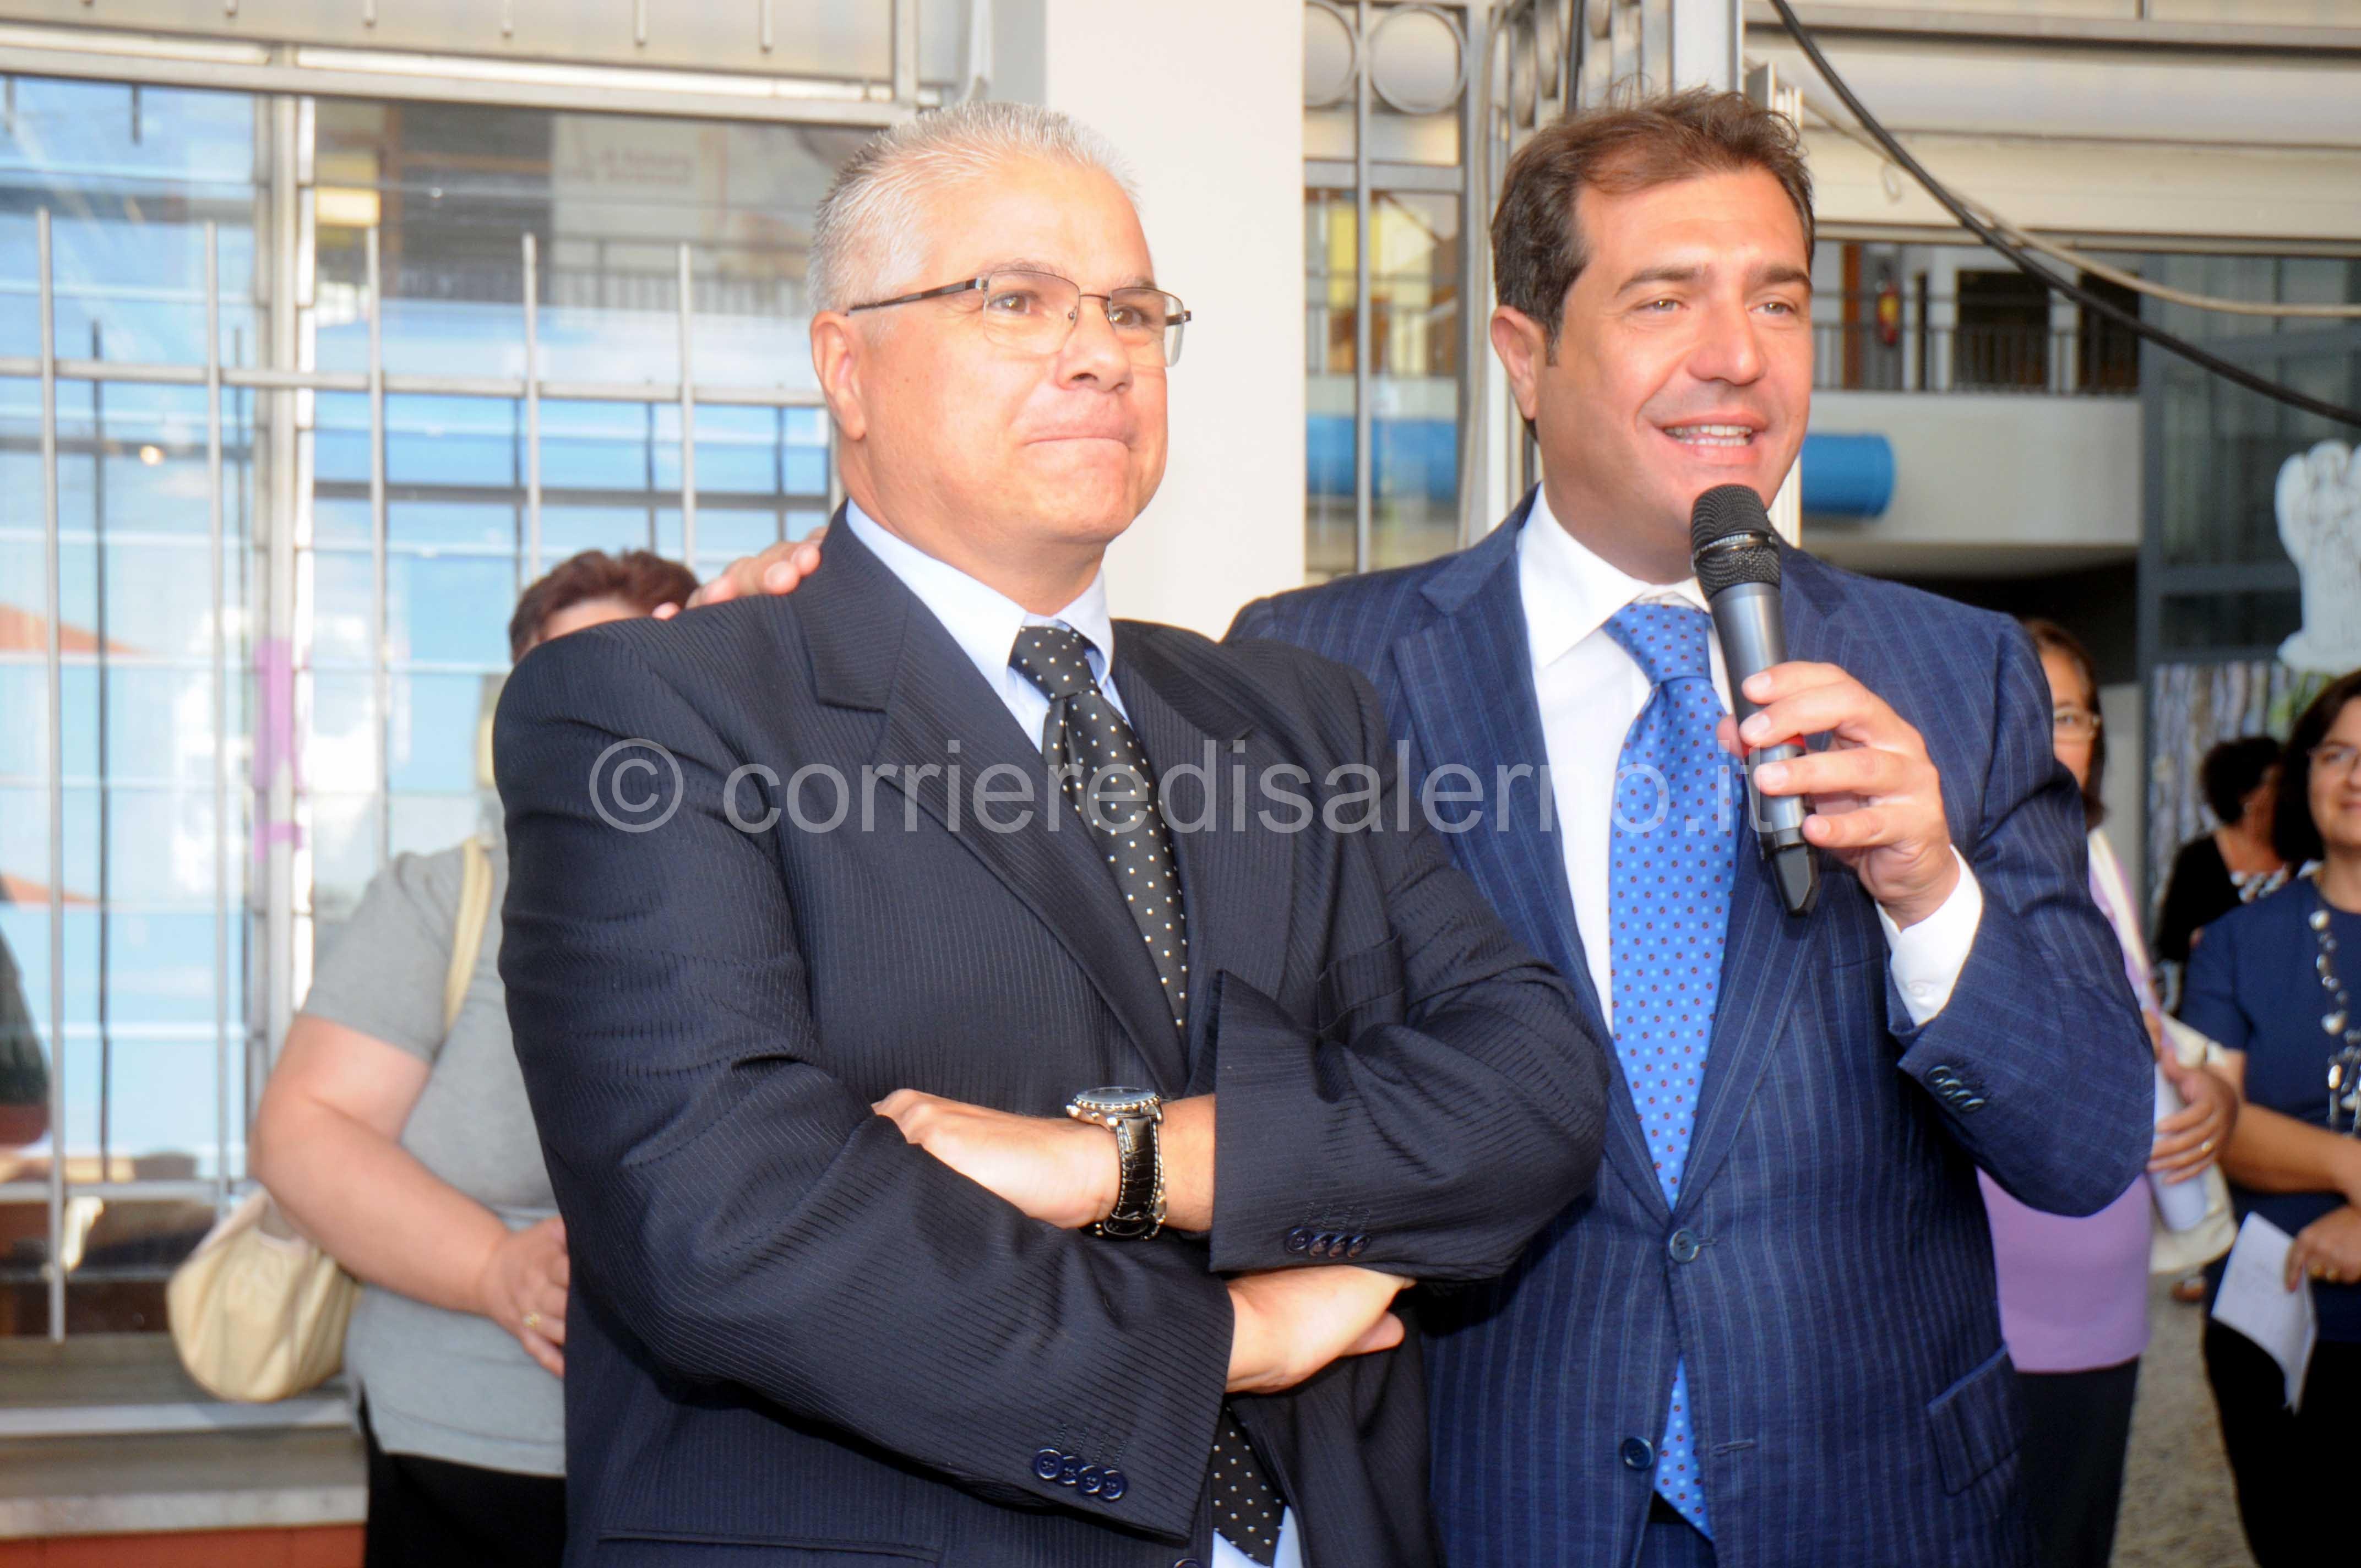 foto picentia sindaco Sica con dirigente Morriale